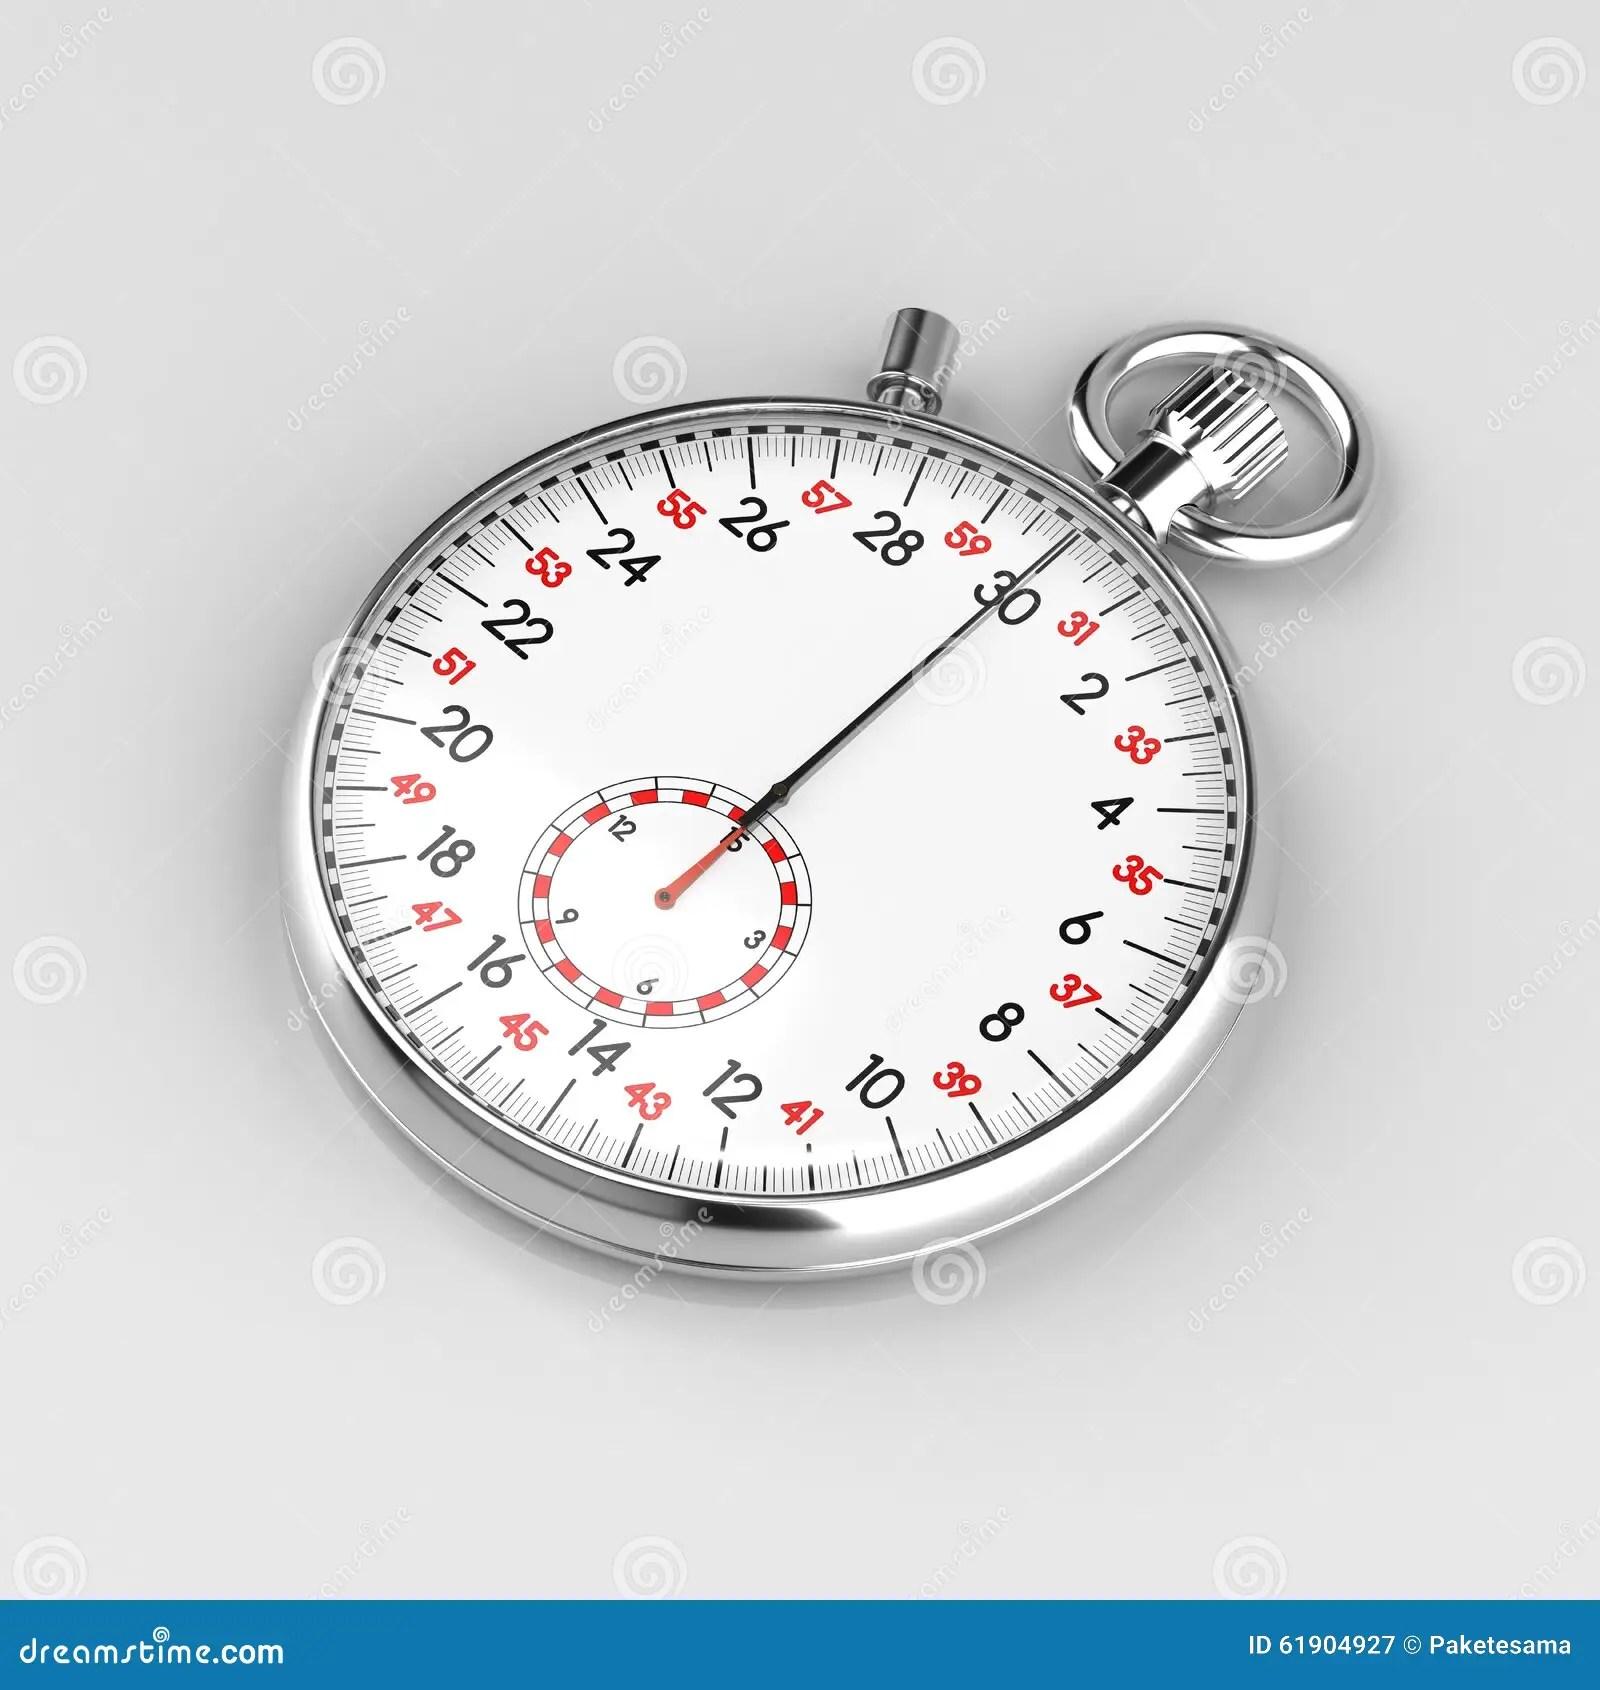 Mechanical Stopwatch Illustration Stock Illustration